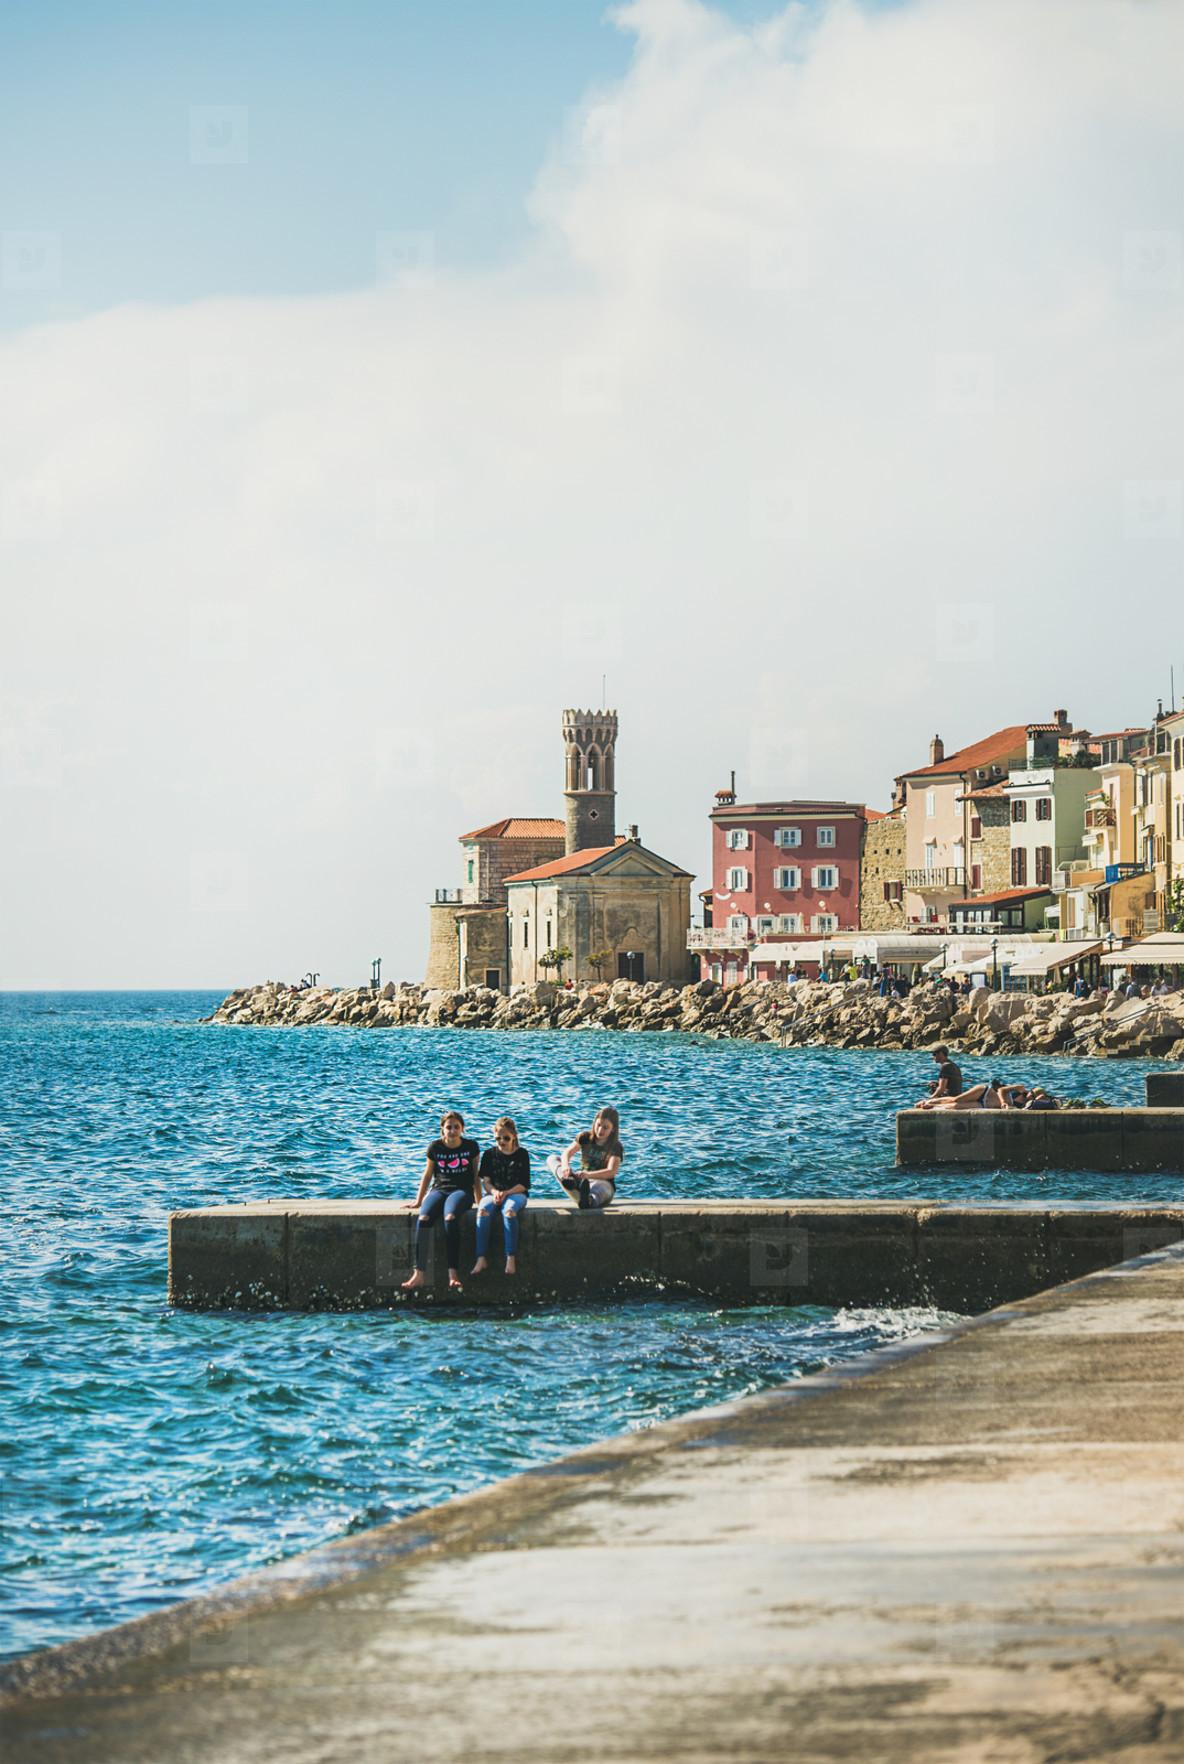 PIRAN  SLOVENIA   MAY 13  2017 View over Adriatic sea embankment